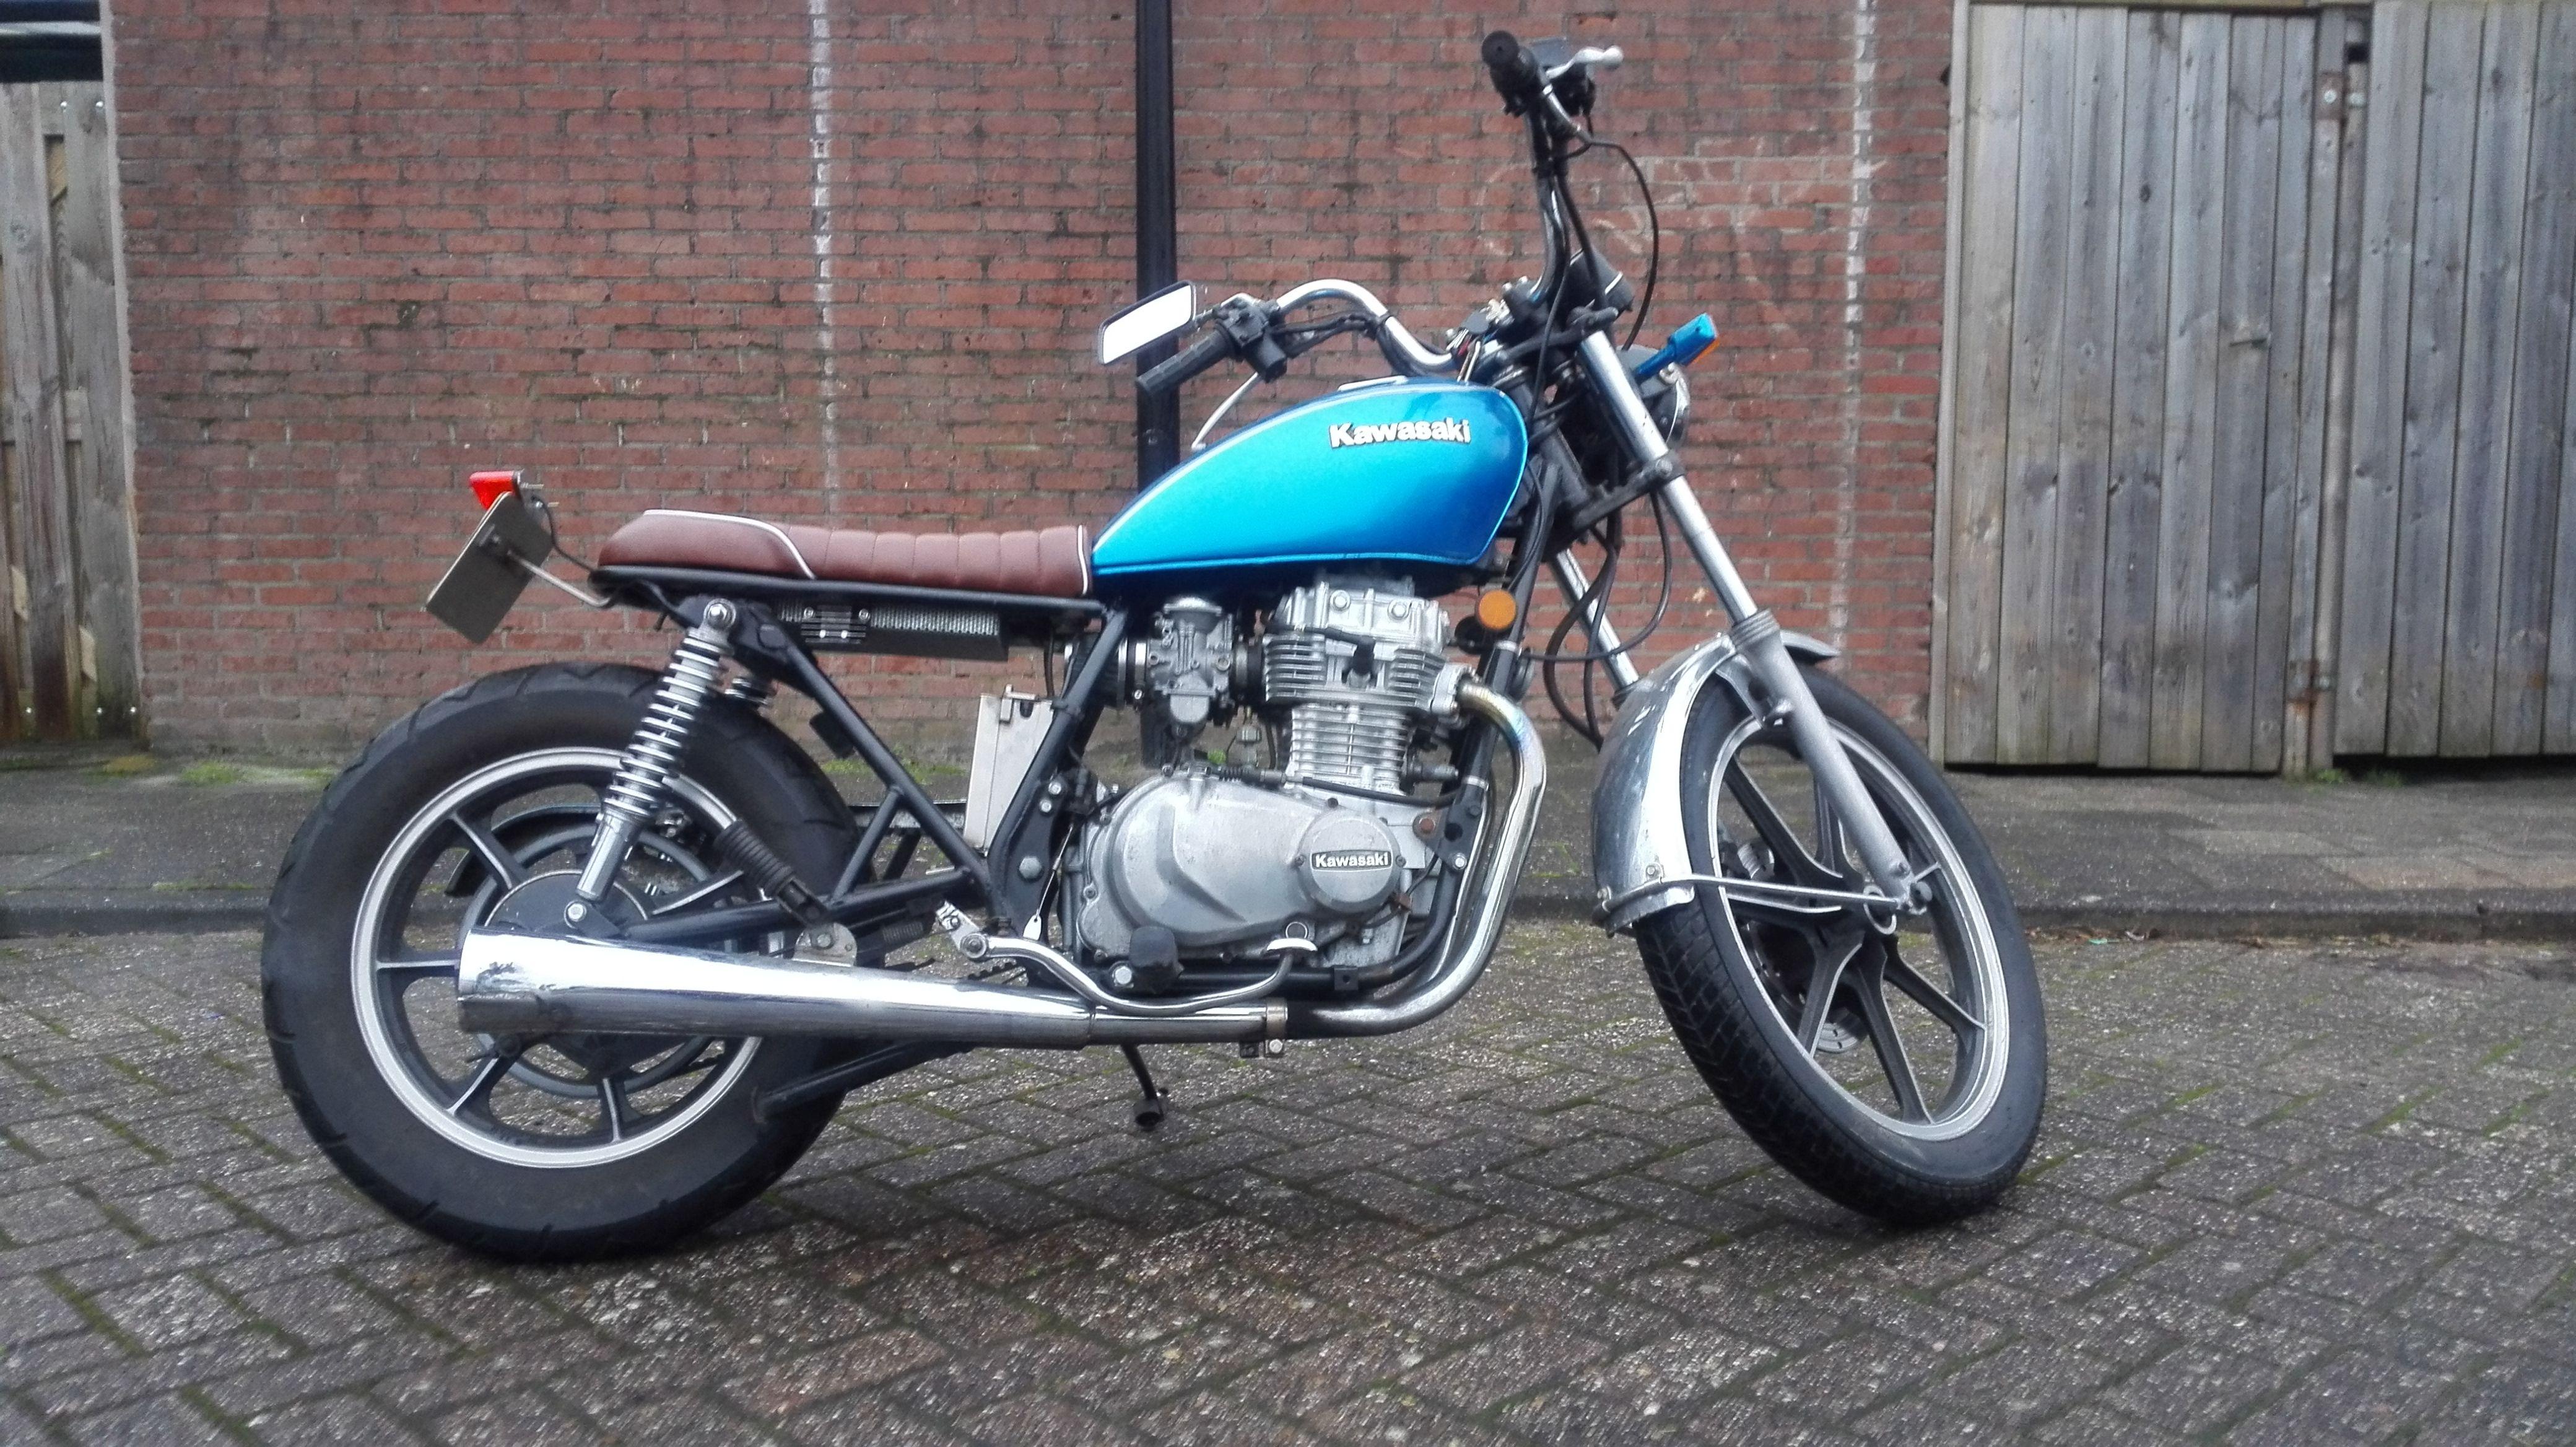 Alot to do kz 440 Kawasaki | KZ440 | Pinterest